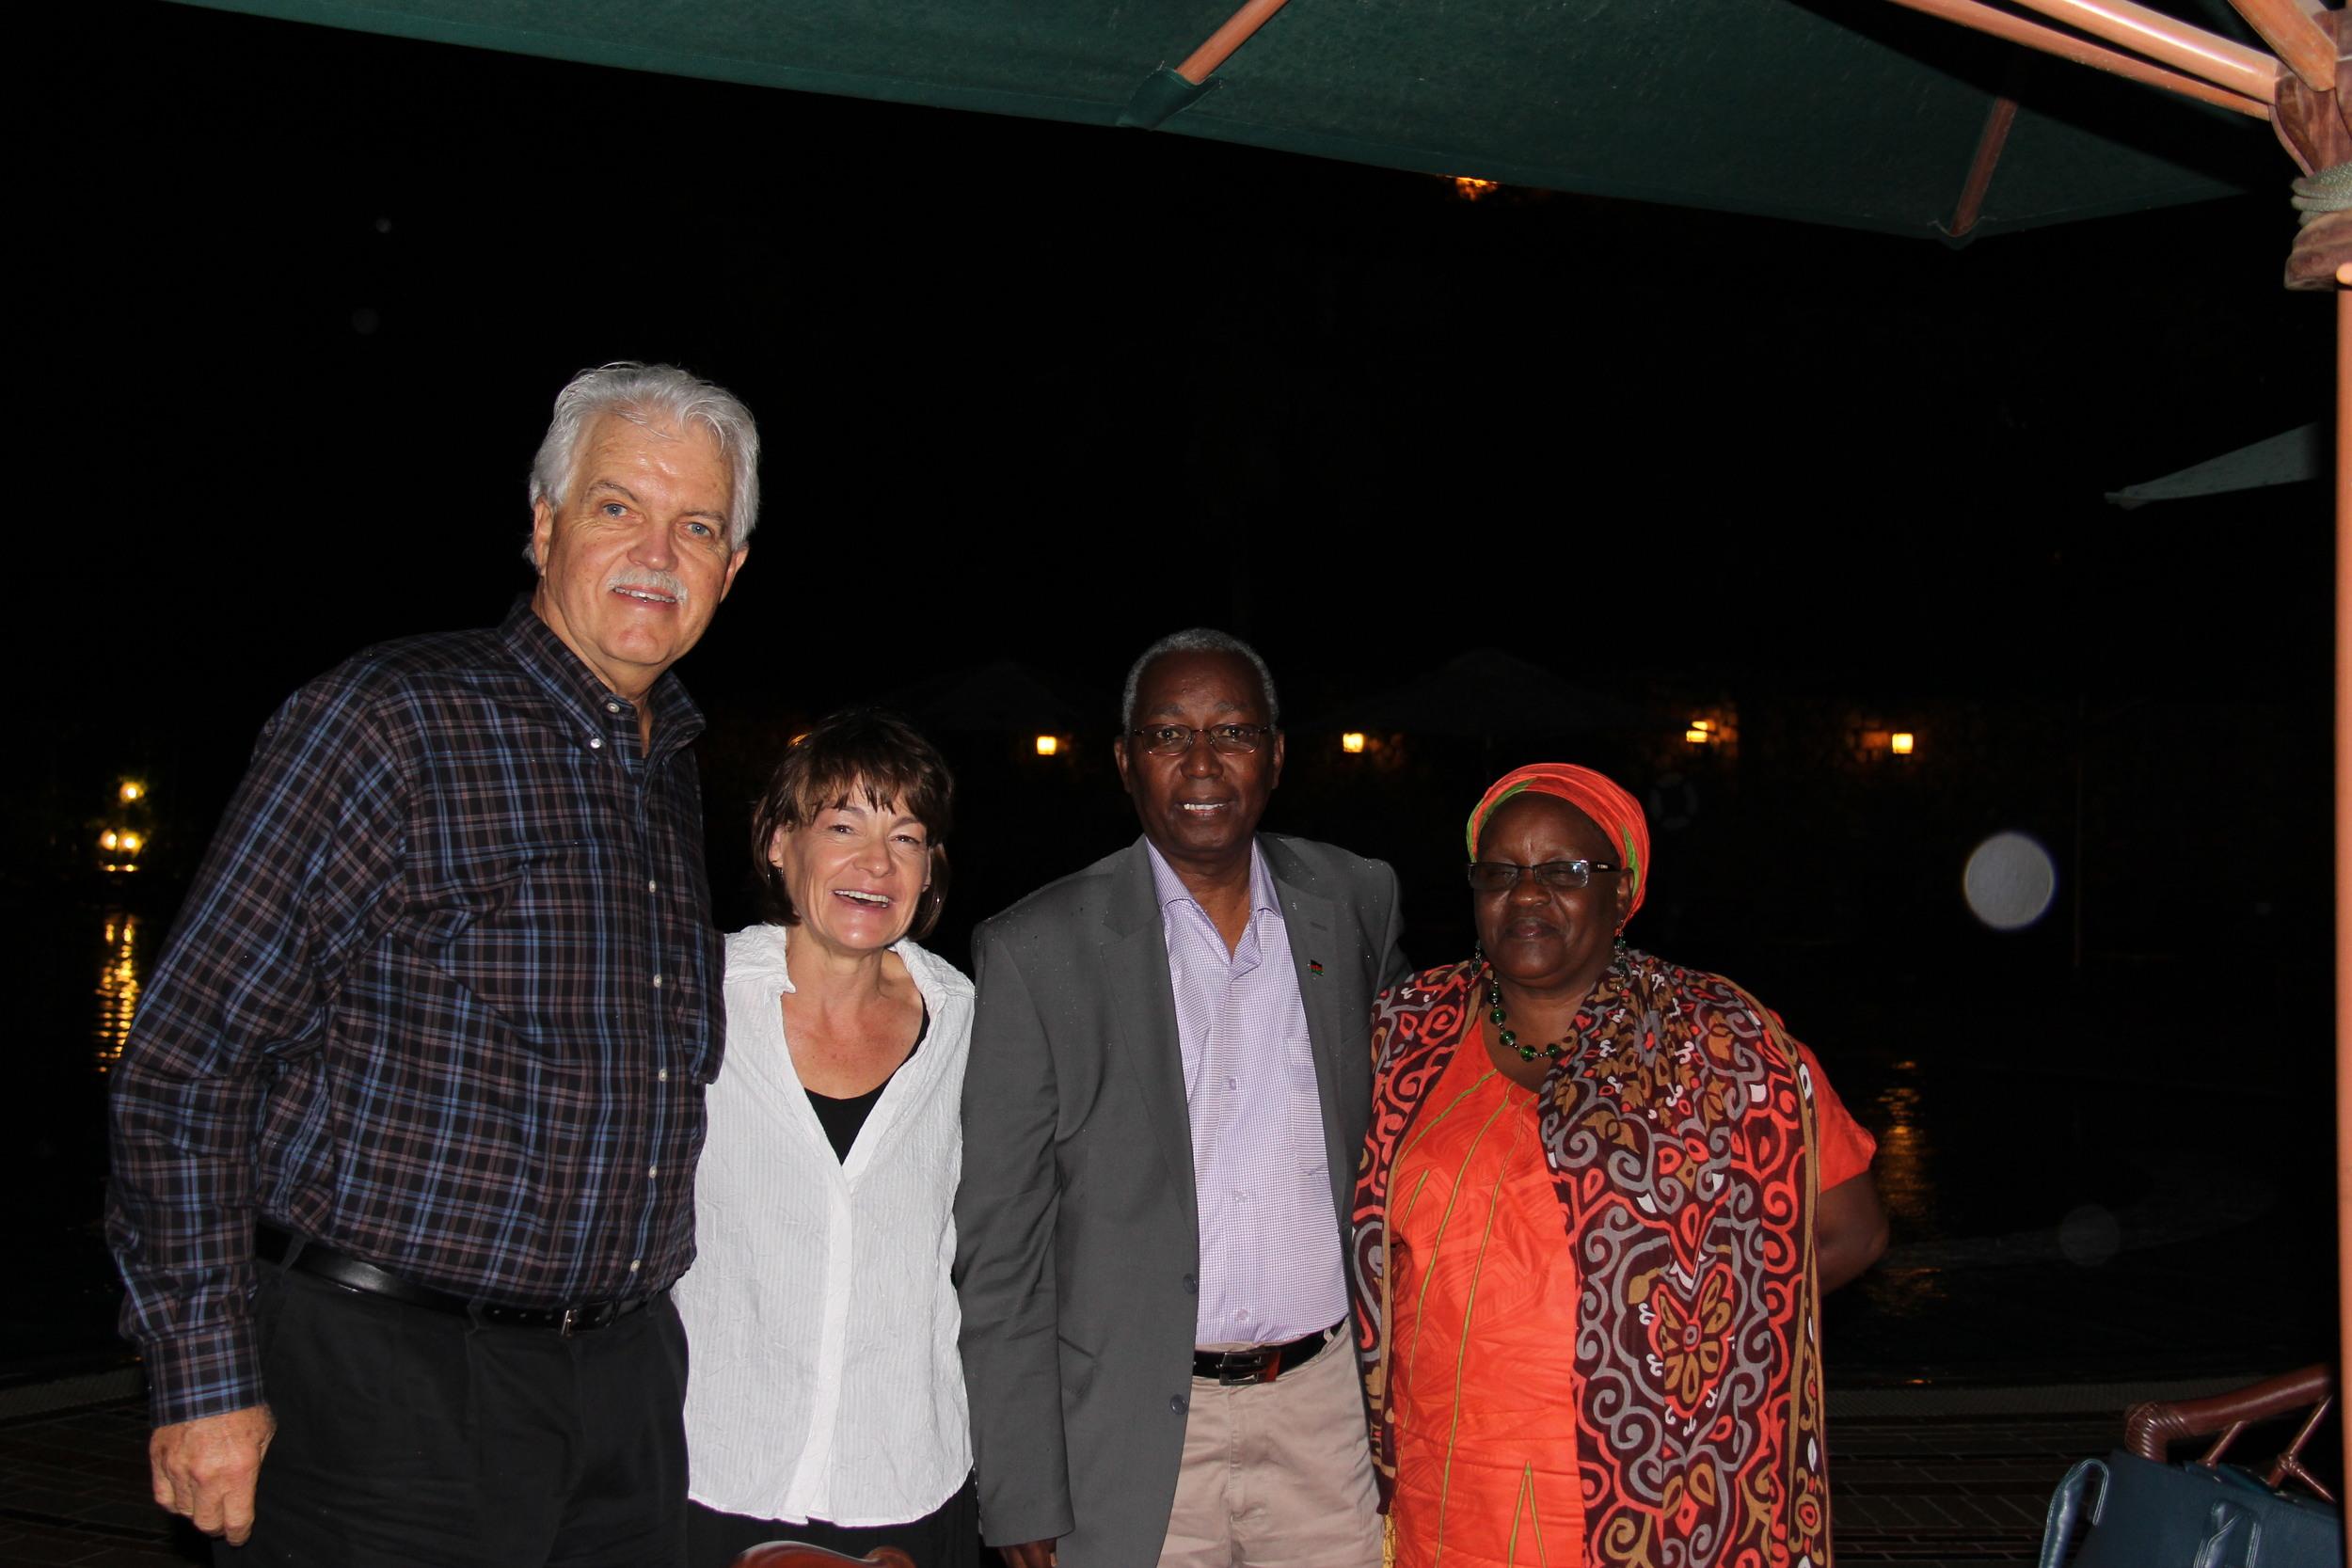 From l-r: Rev. Dr. Doug Millham (Discover the World), Melinda Lehman,    Mr. Bernard Waweru (Chairmen of Shelter Children's Center Board), Mary Muriuri (Director, Shelter Children's Center)